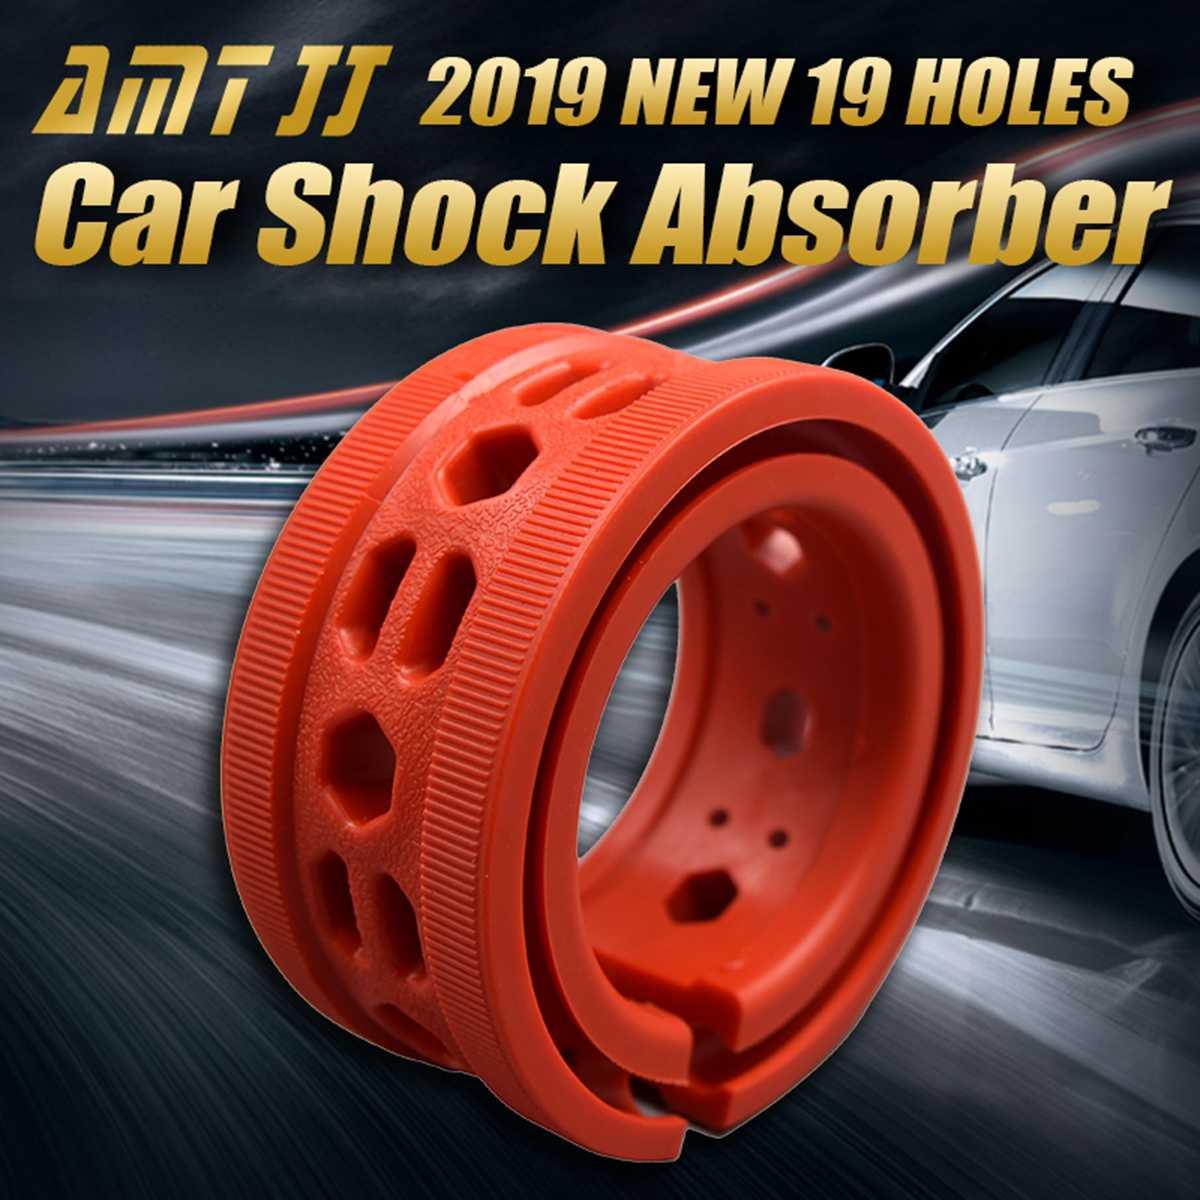 Absorbente de choque de coche 2 piezas para el parachoques de resorte de amortiguación de coche A/A +/B + /C/D/E/F tipo muelles amortiguadores Universal